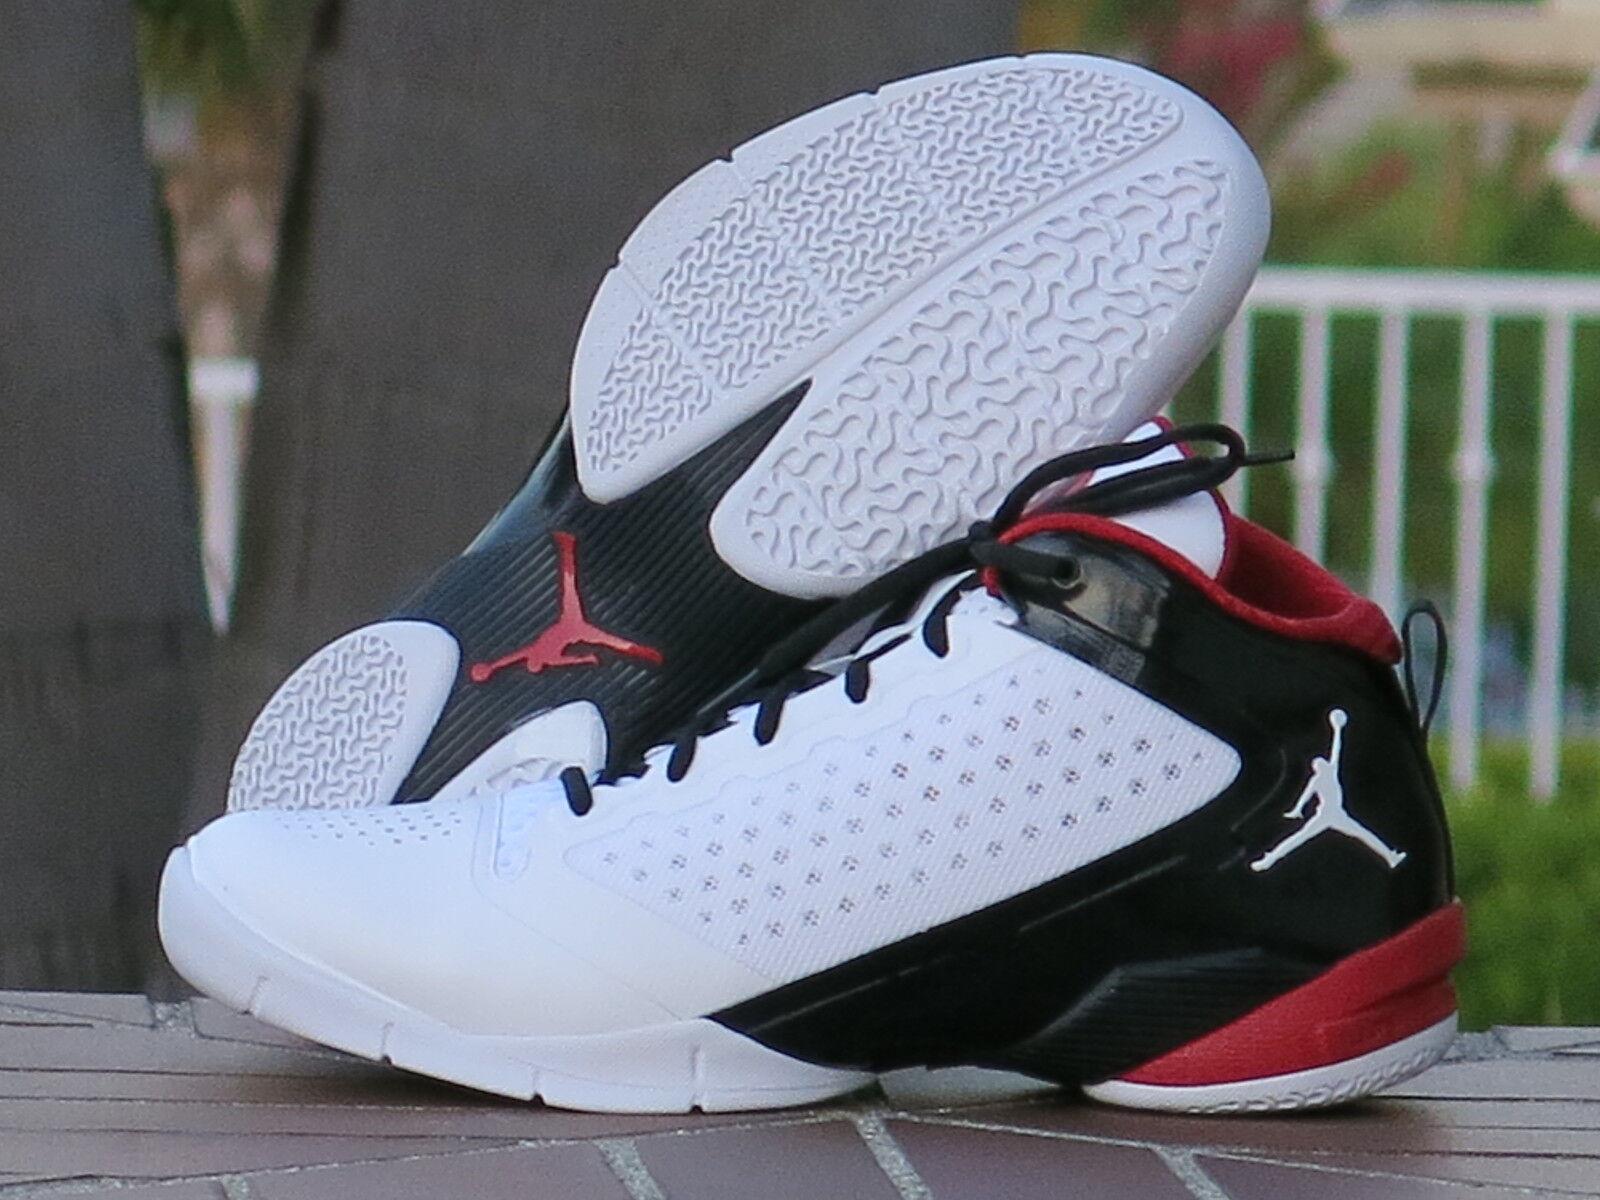 Nike Air Jordan Fly 2011 Dwayne Wade II White/Black/Red/Grey 479976